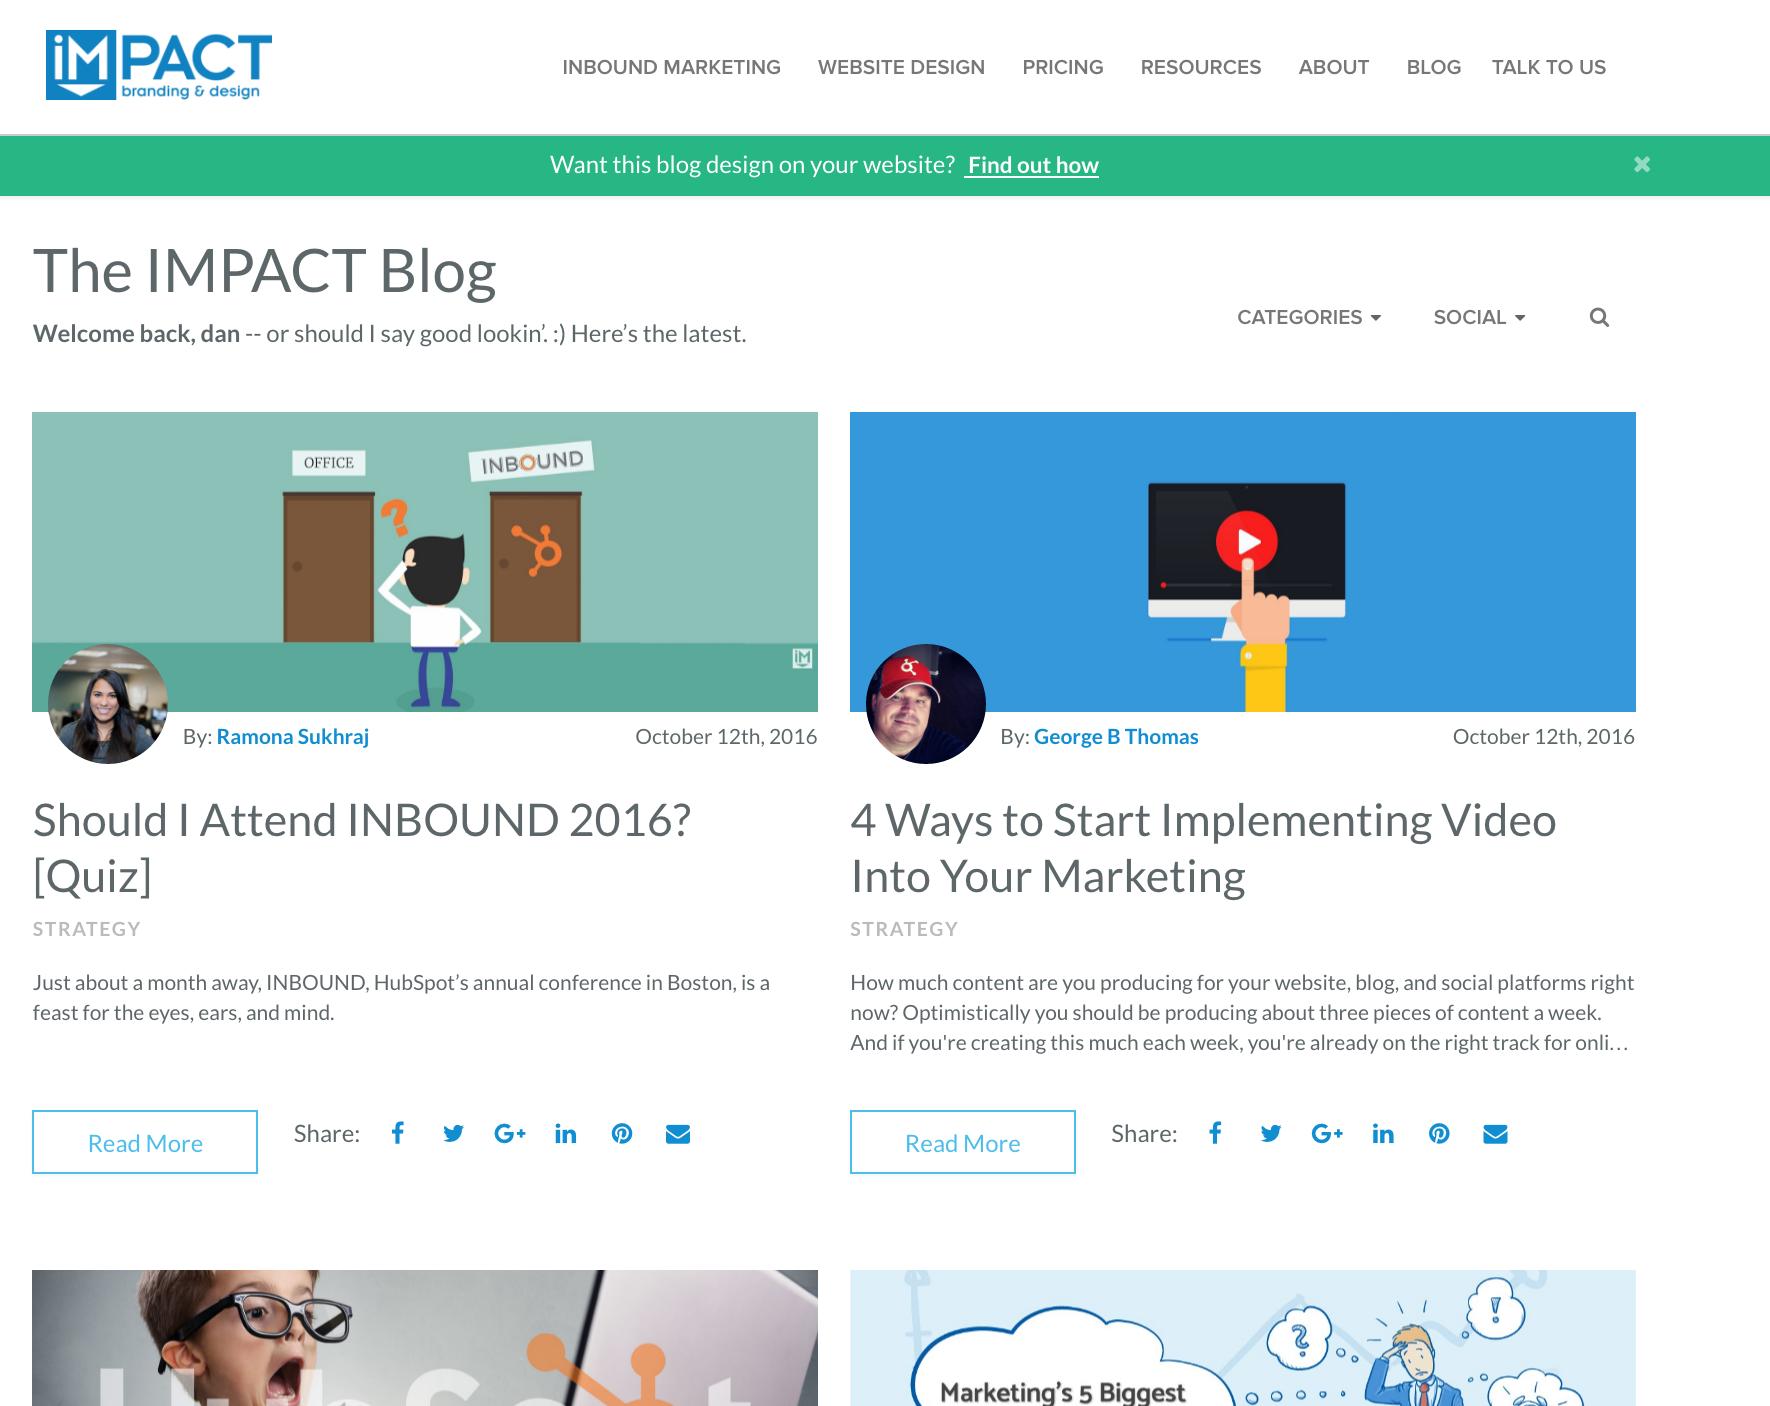 IMPACT Branding and Design inbound marketing blogs